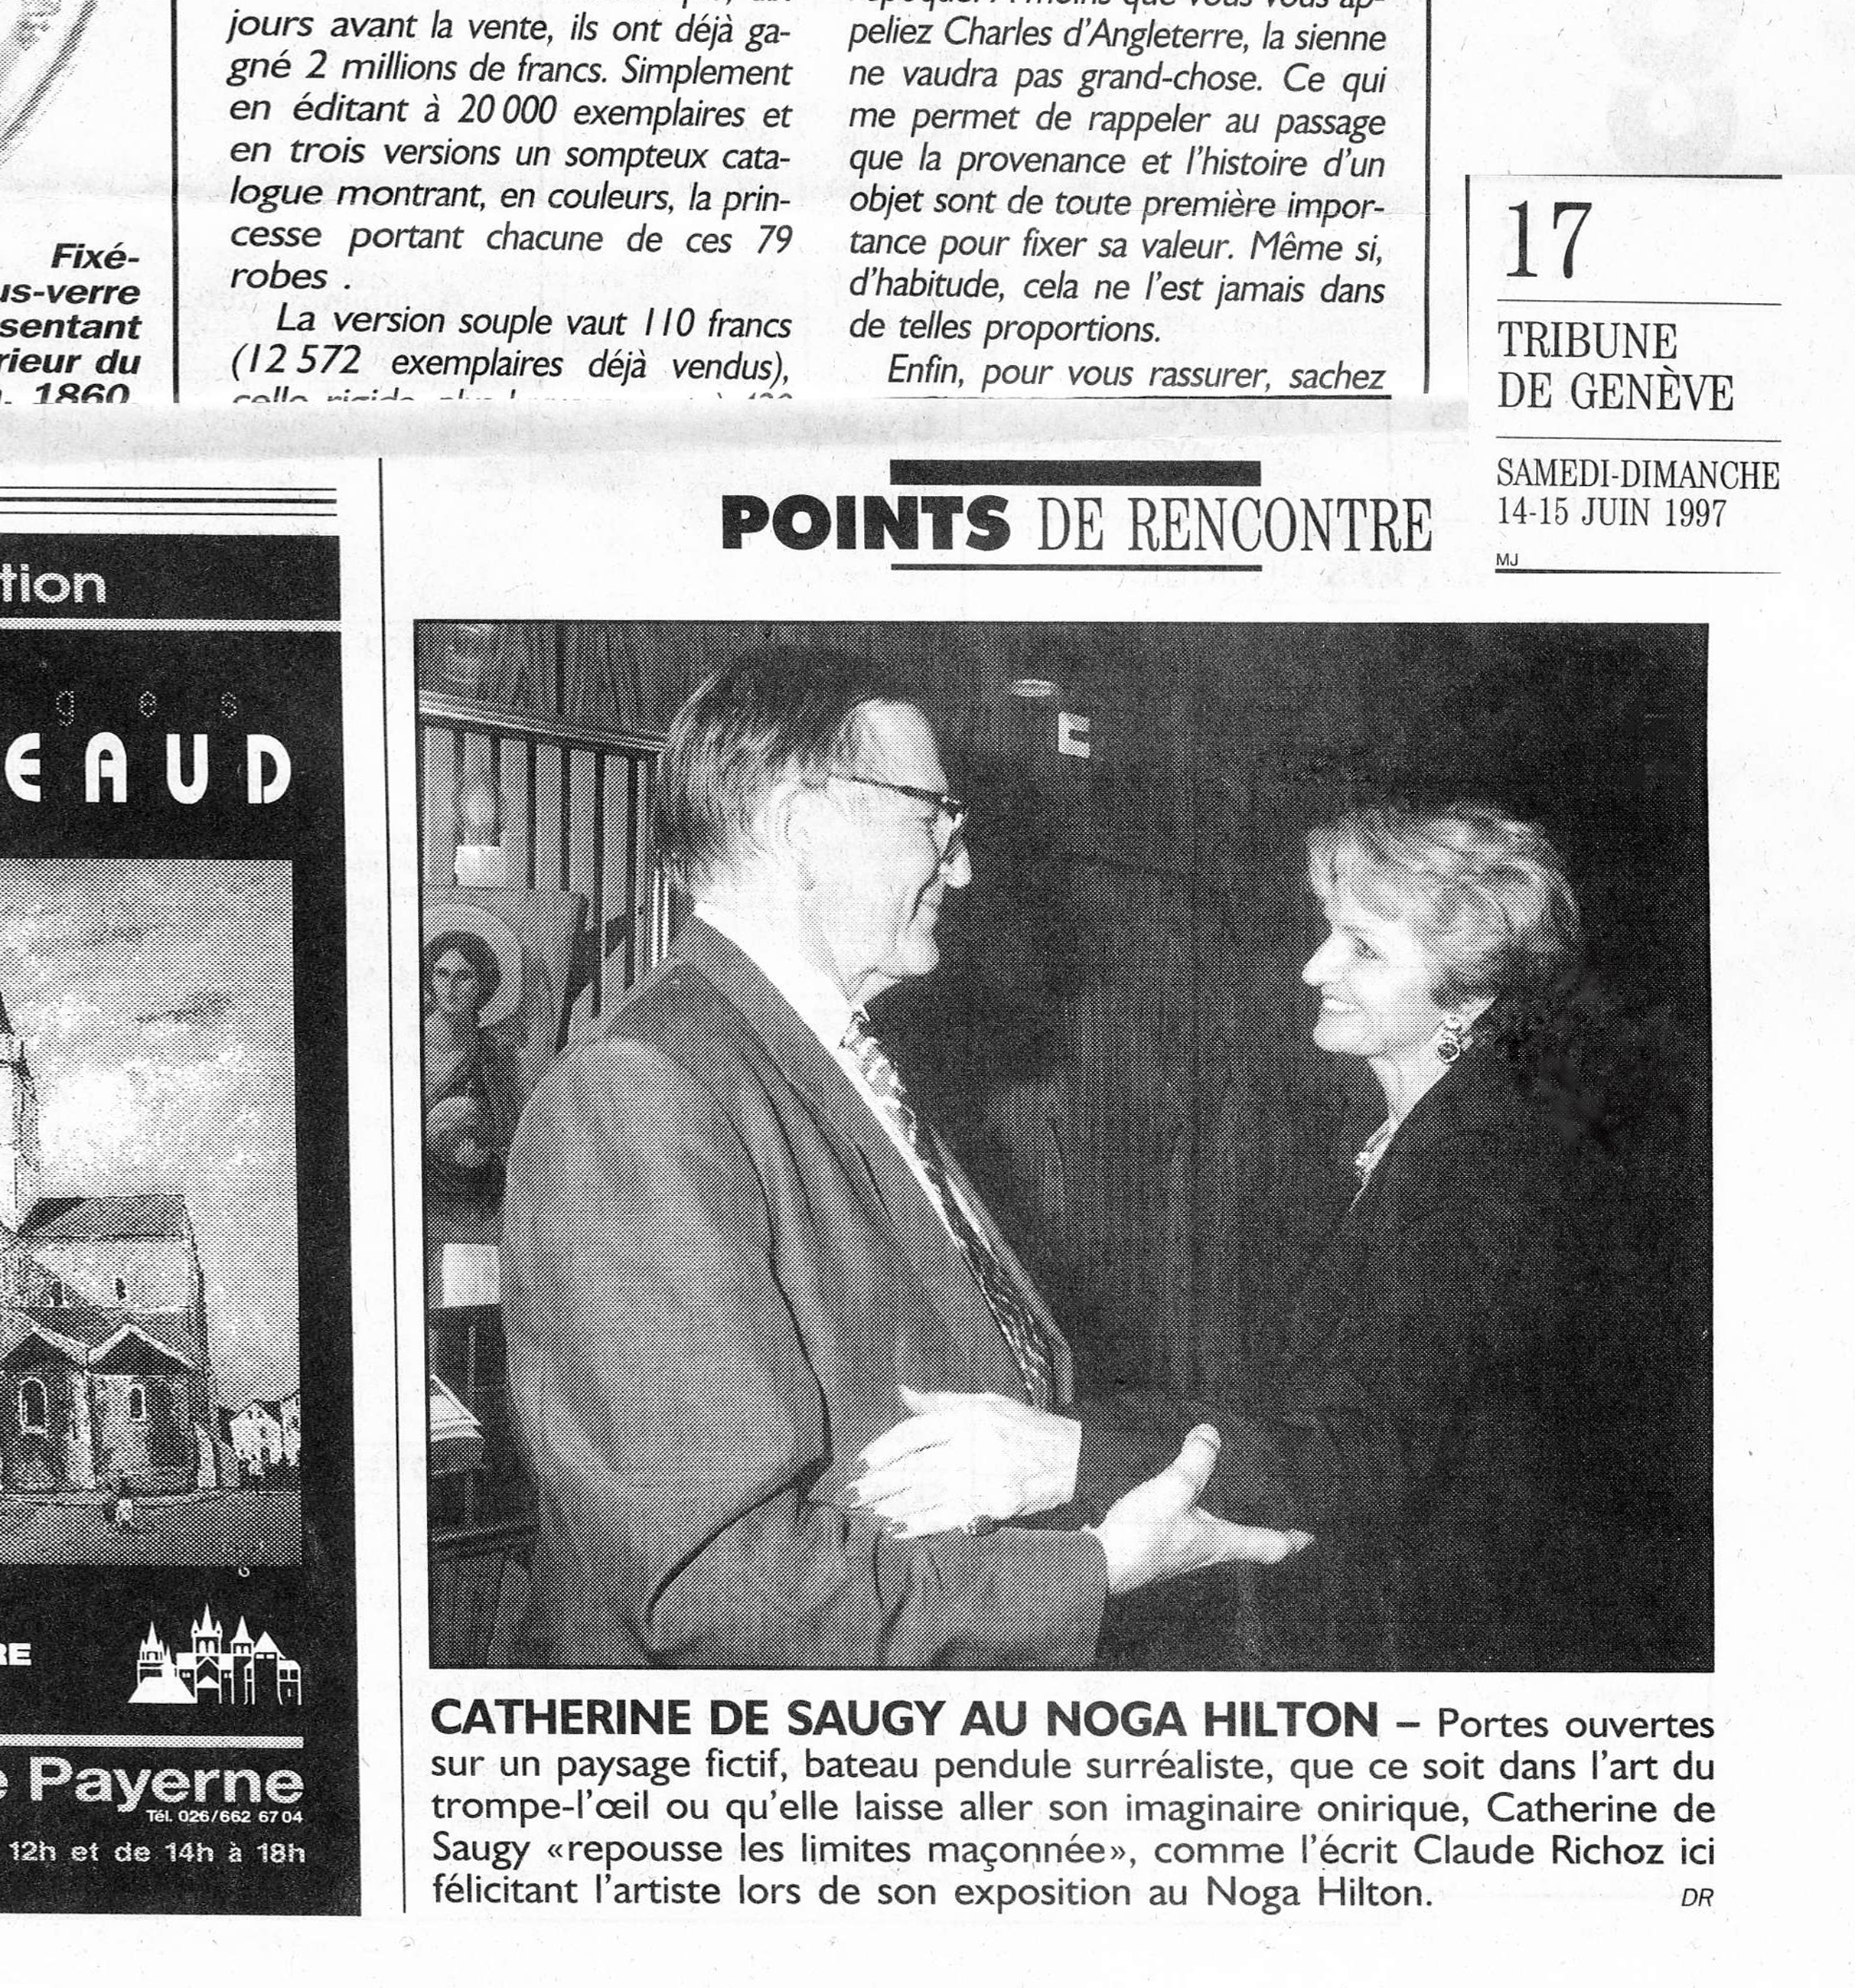 1997 Vernissage NOGA HILTON GENEVA Claude RICHOZ & CDS